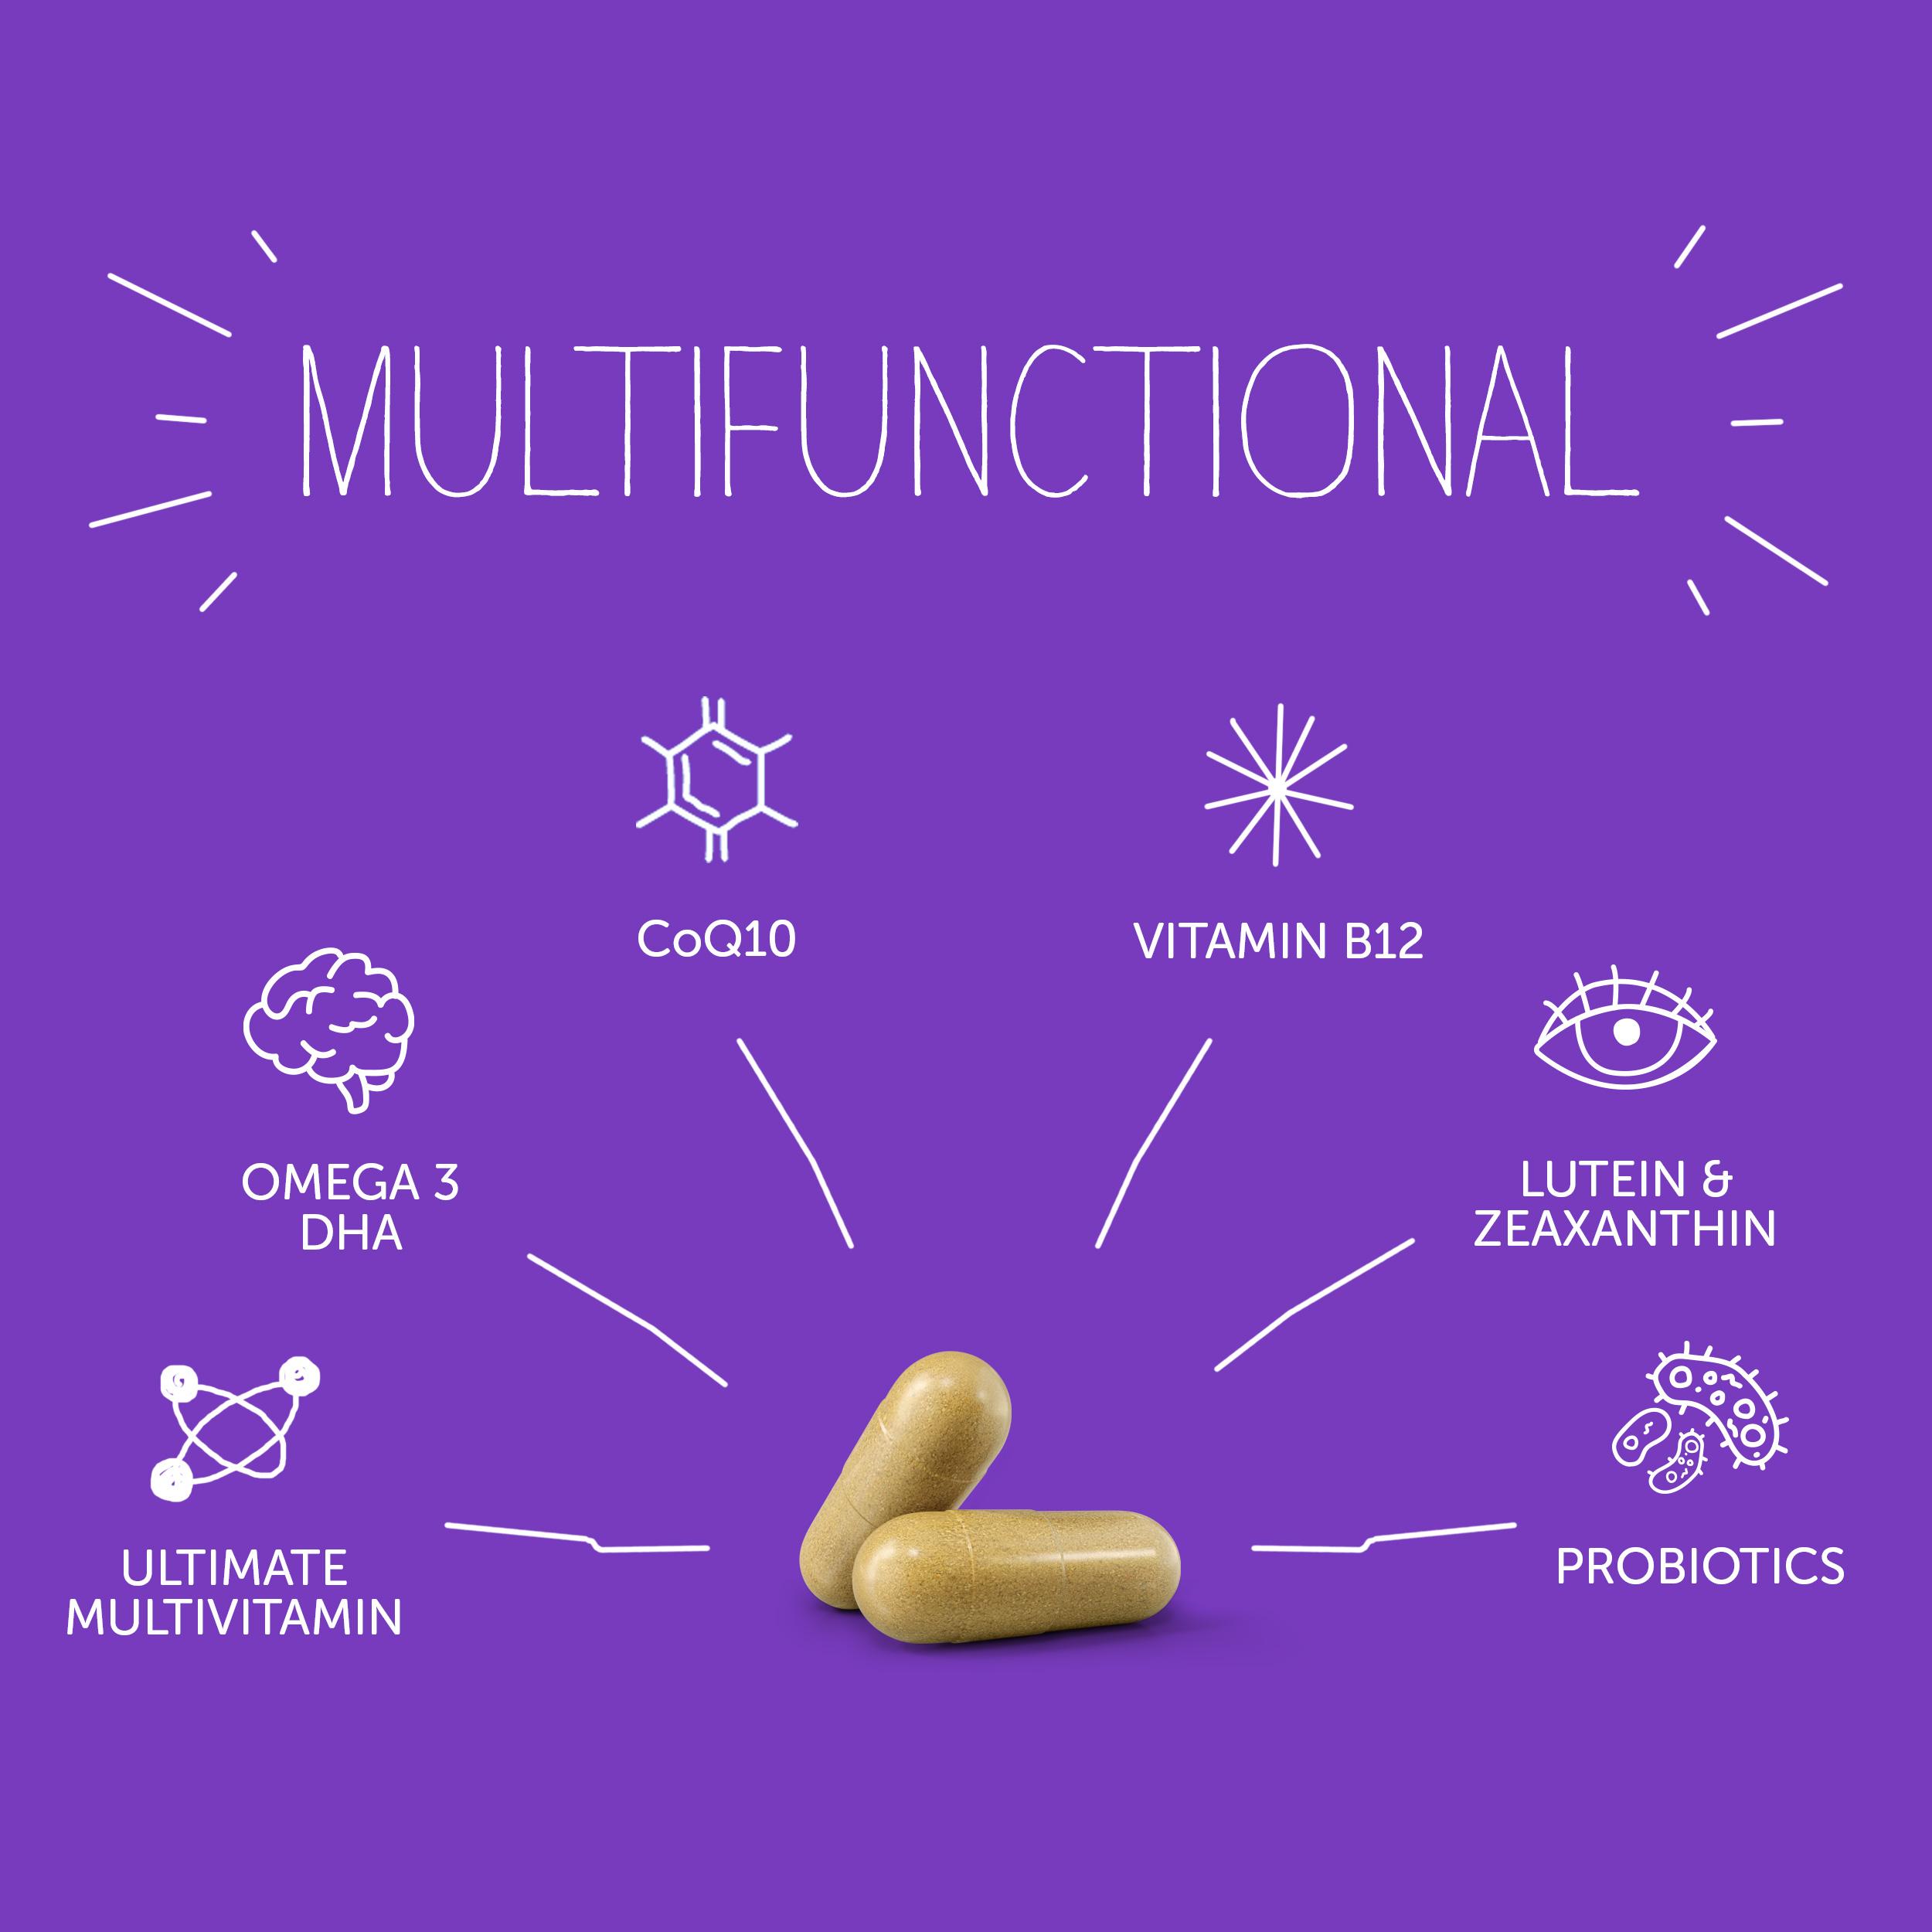 PhD Multifunctional Health Supplement for Men